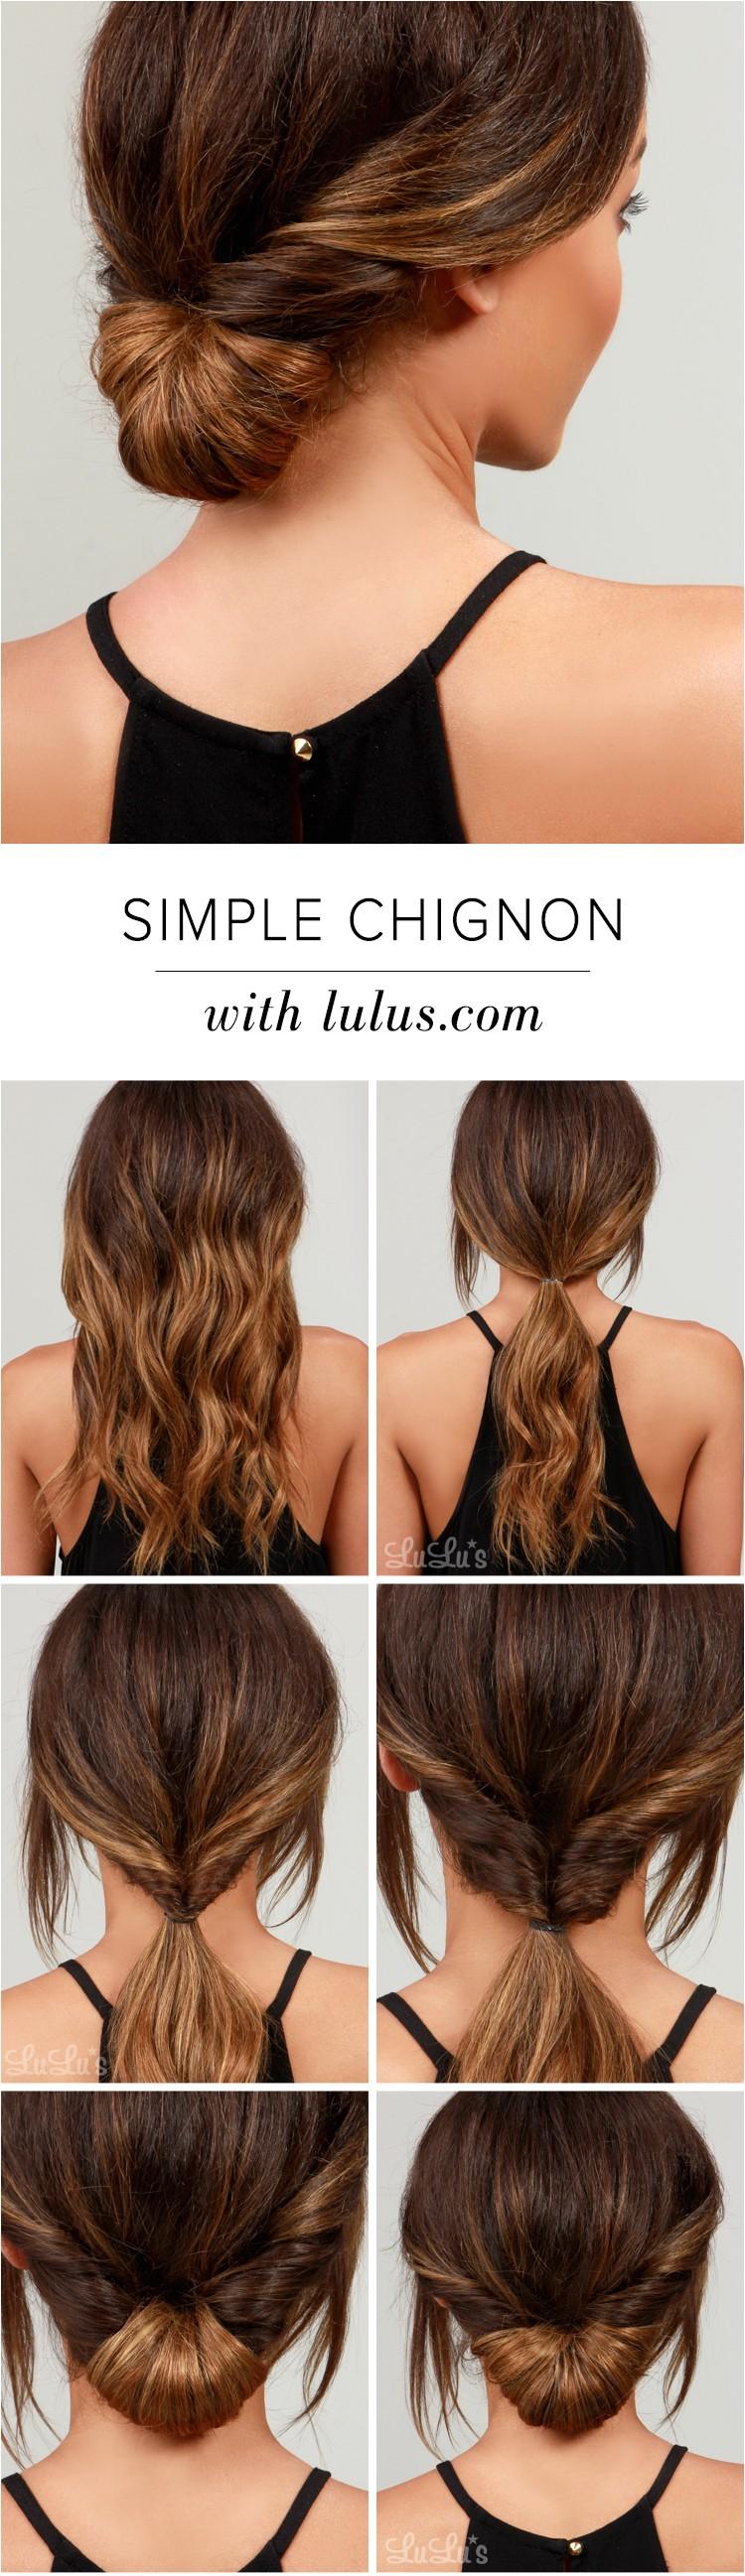 lulus how to simple chignon hair tutorial